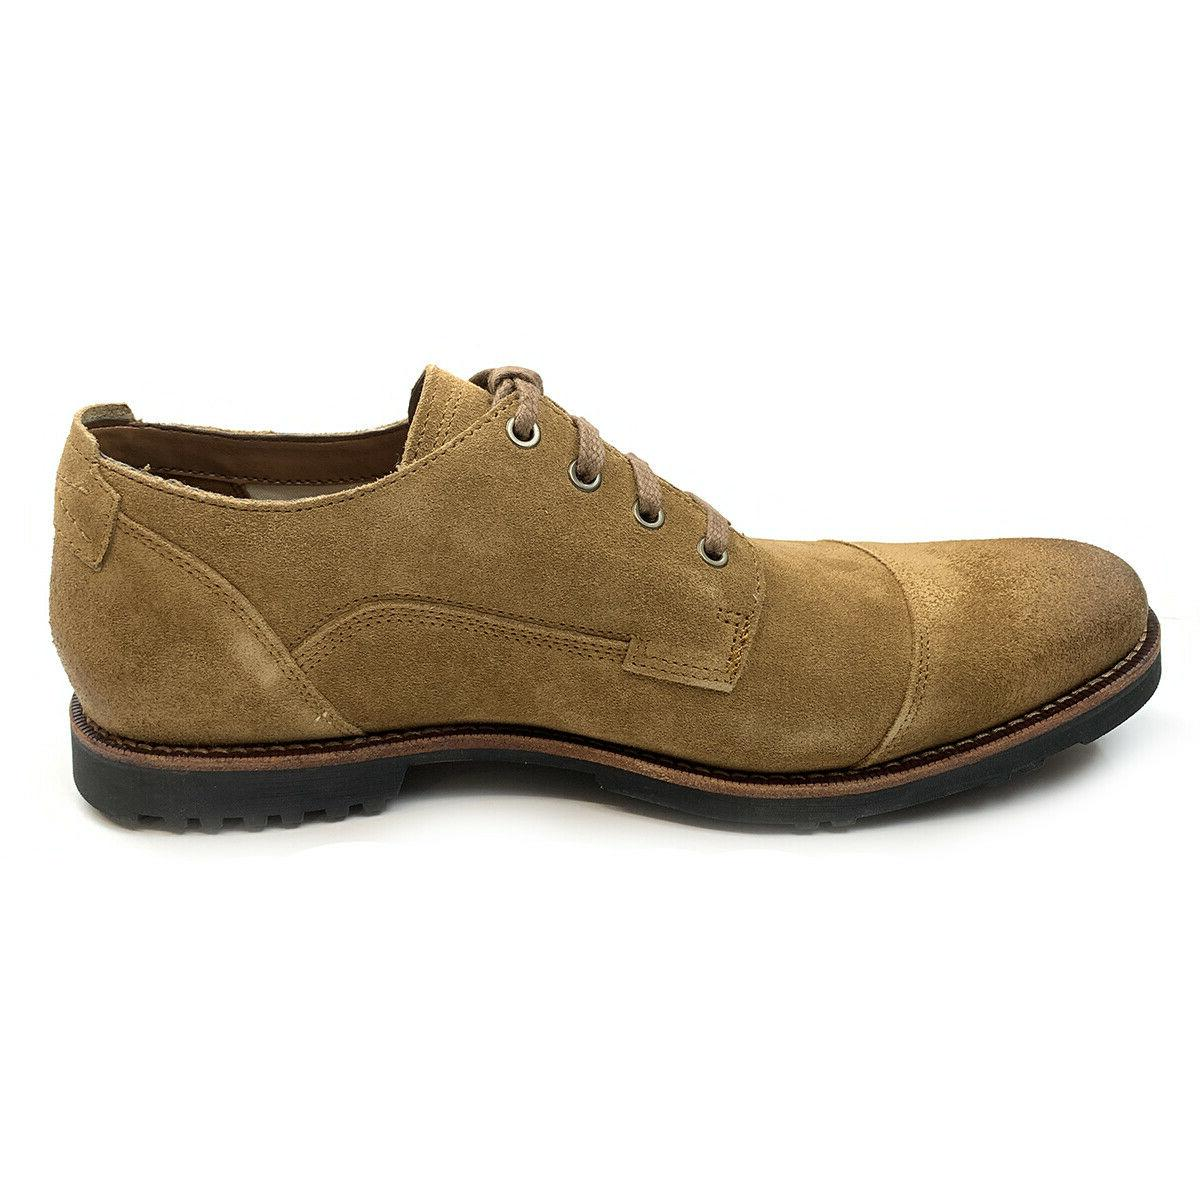 Toe Medium Brown Oxford Shoes